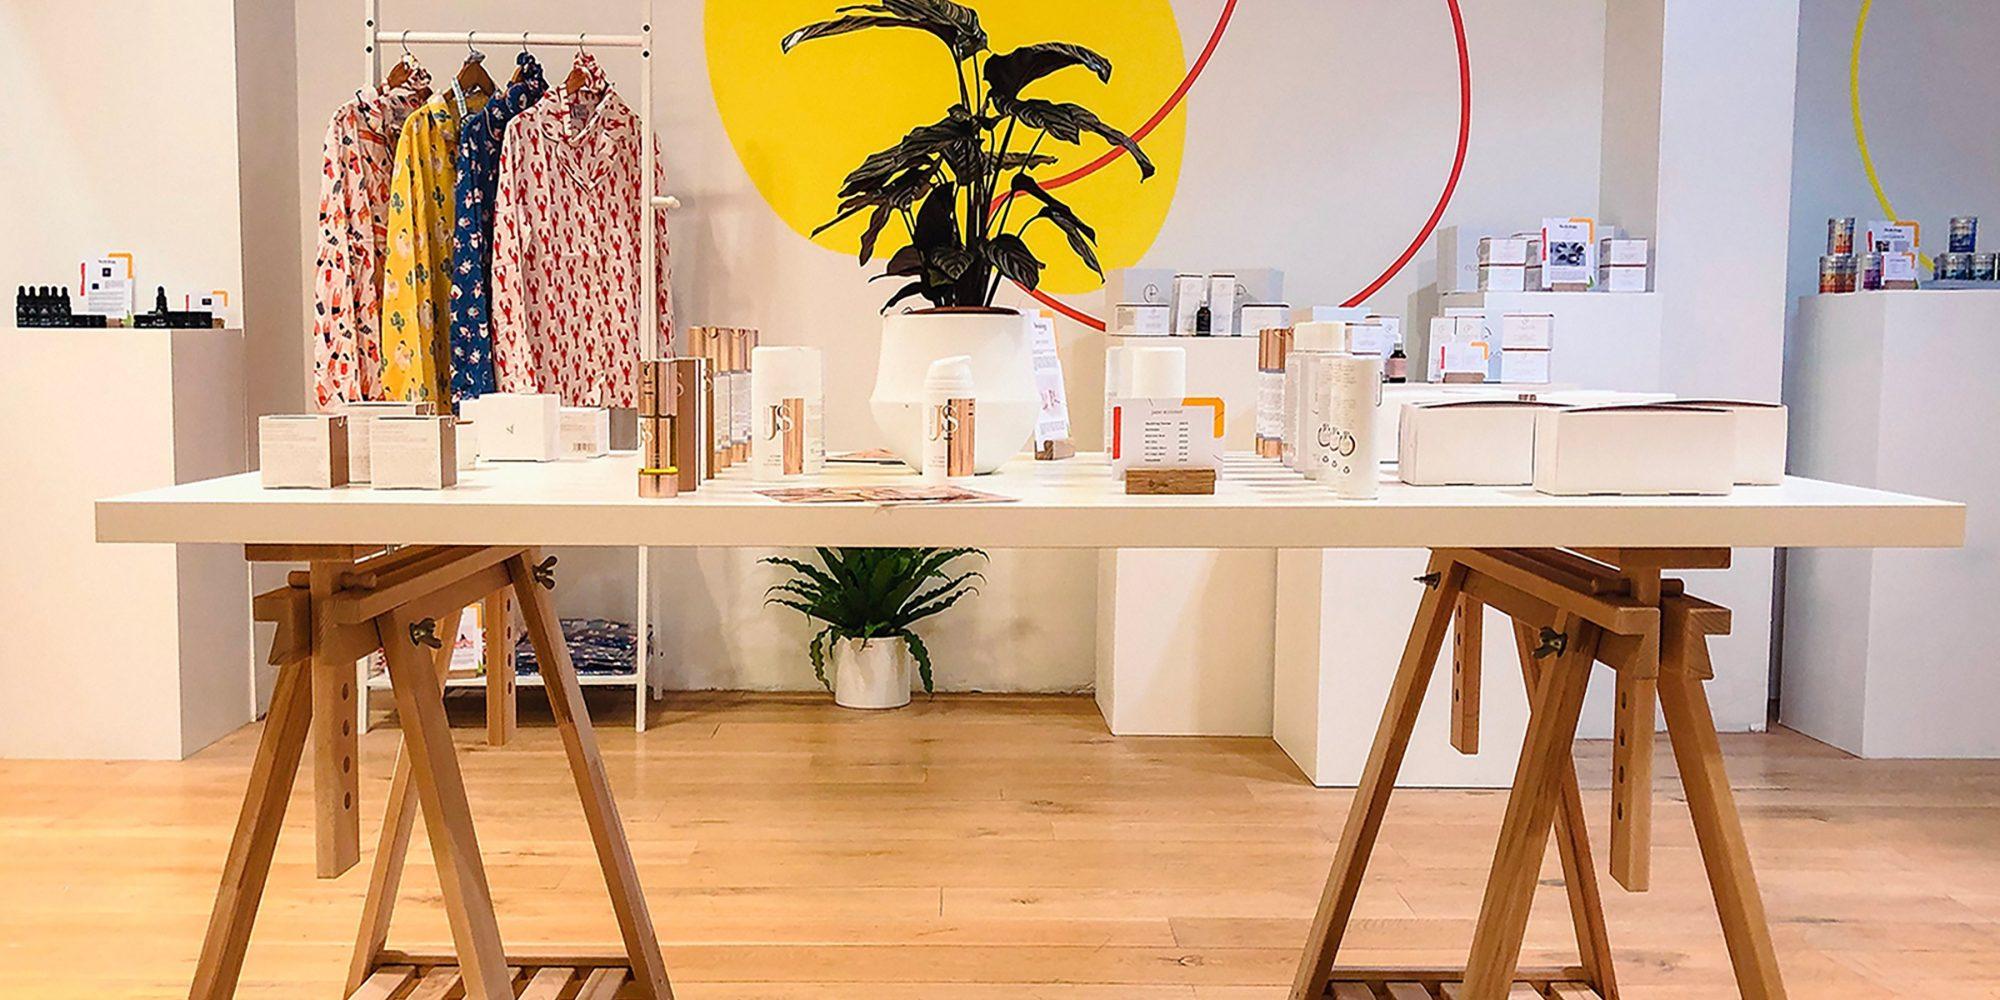 Former John Lewis Buyer Rebecca Saunders Opens London Pop-Up Shop Seekology To Showcase Emerging Beauty Brands